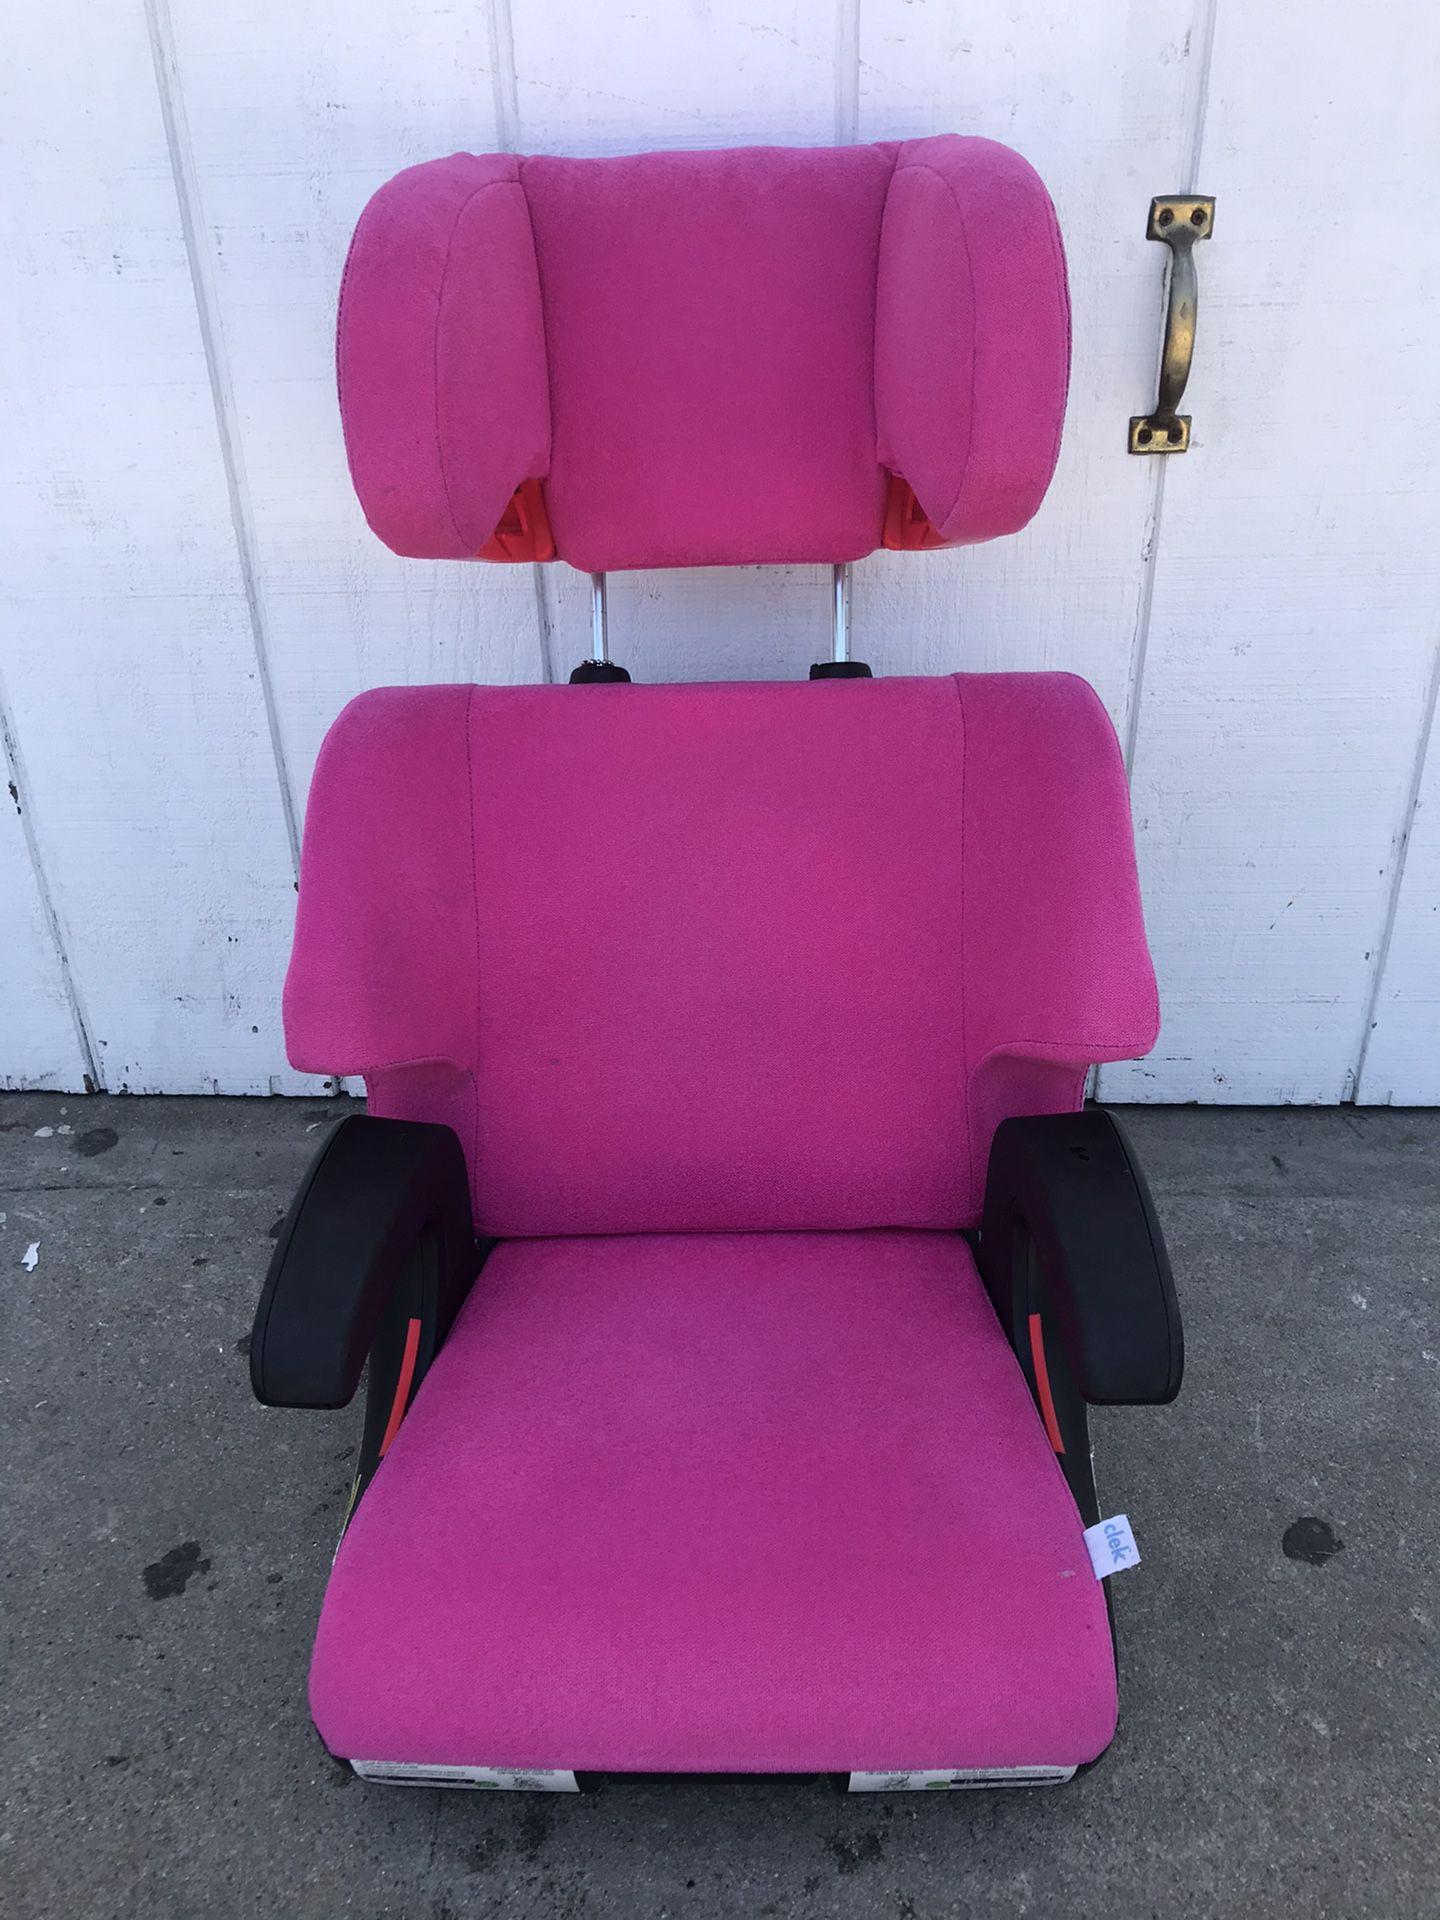 BOOSTER SEAT CLEK